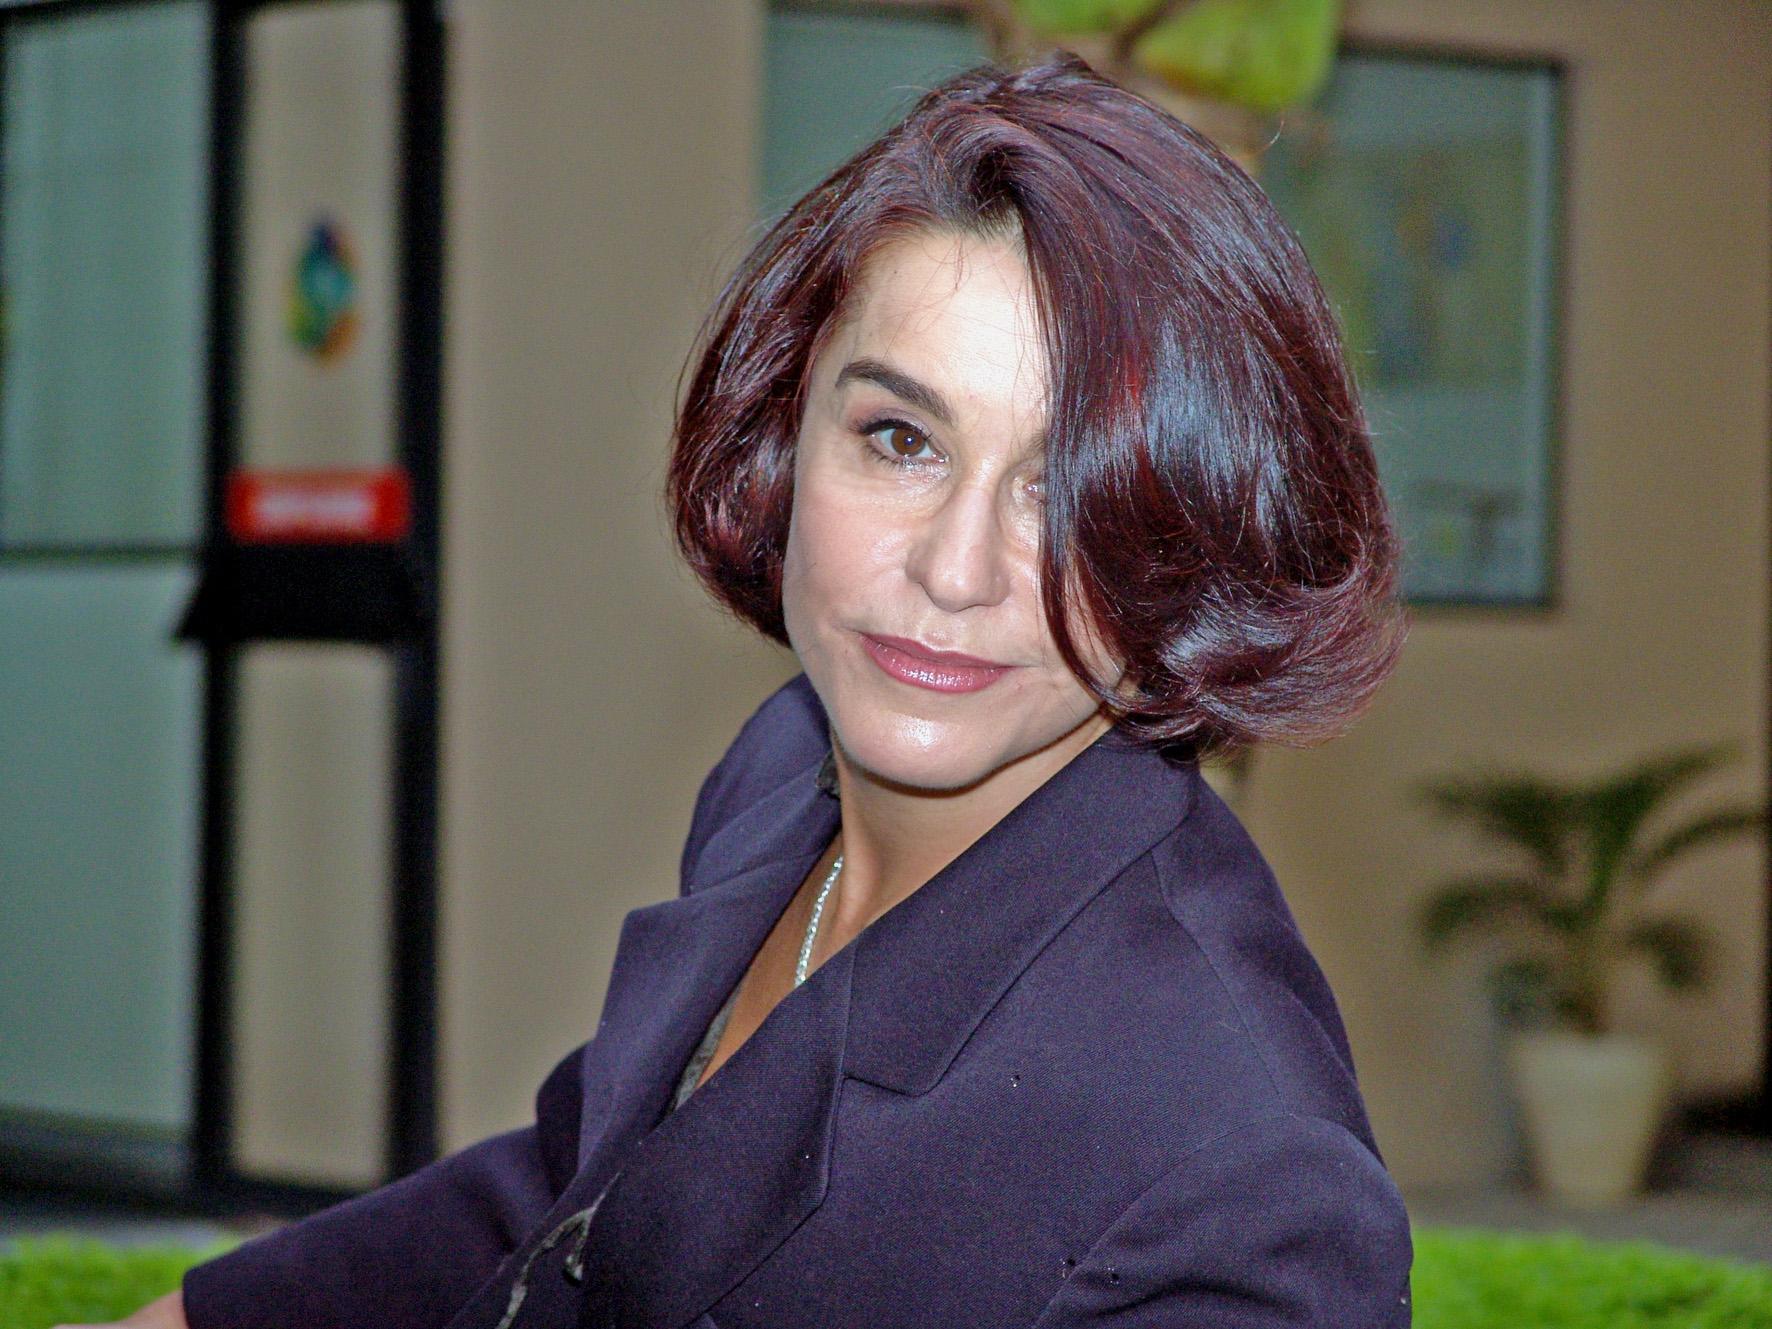 http://upload.wikimedia.org/wikipedia/commons/b/b1/Lucelia_Santos_9.jpg